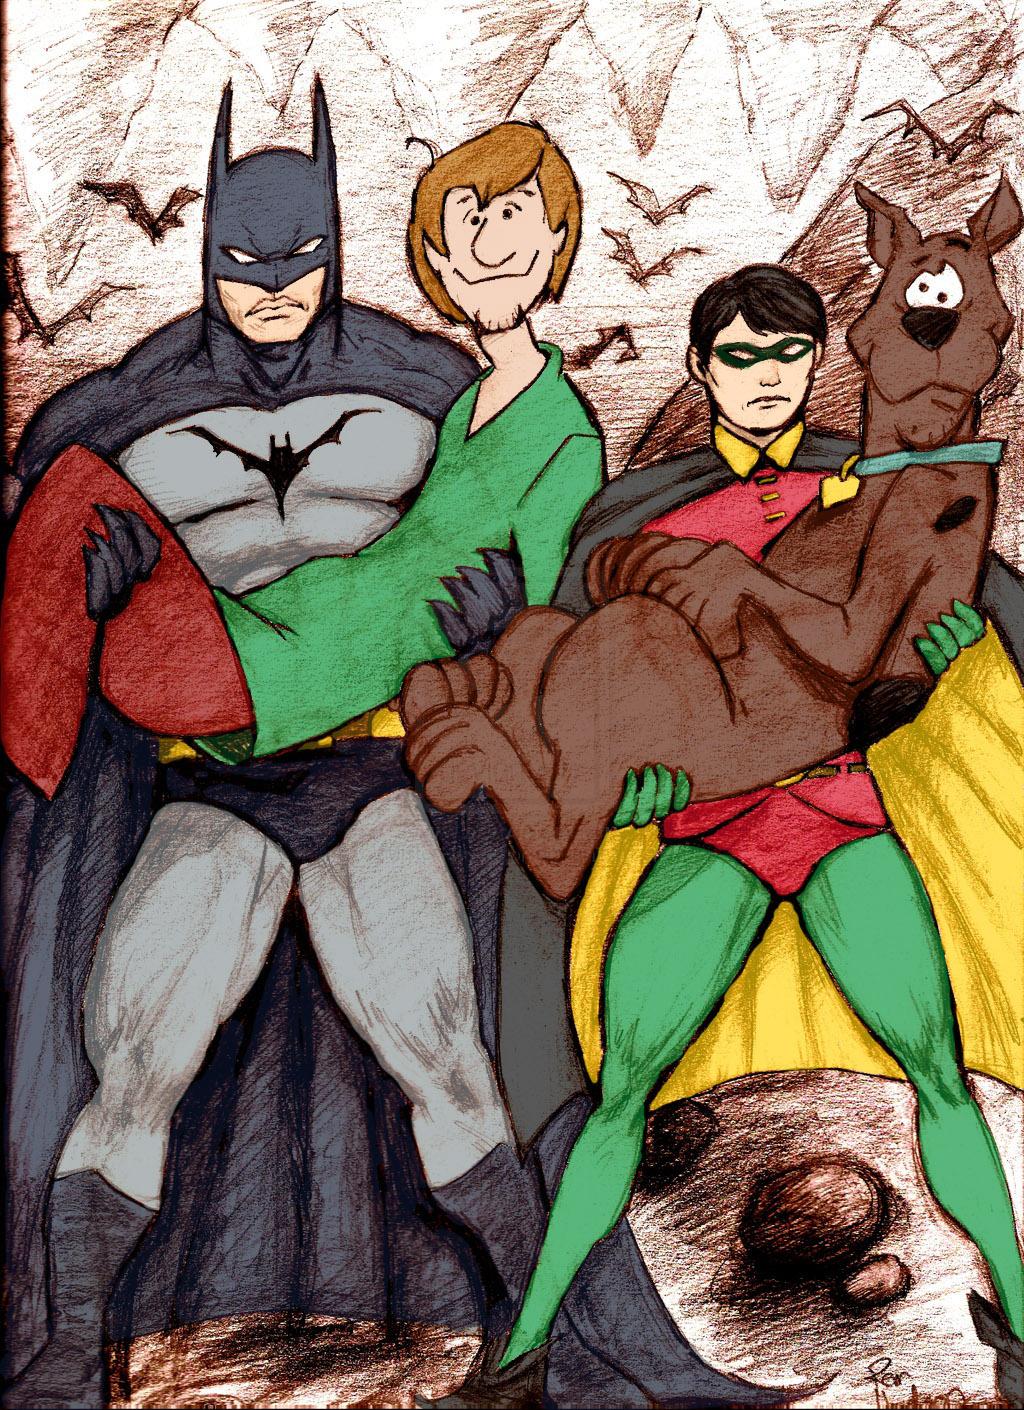 Scooby doo rencontre jeannie